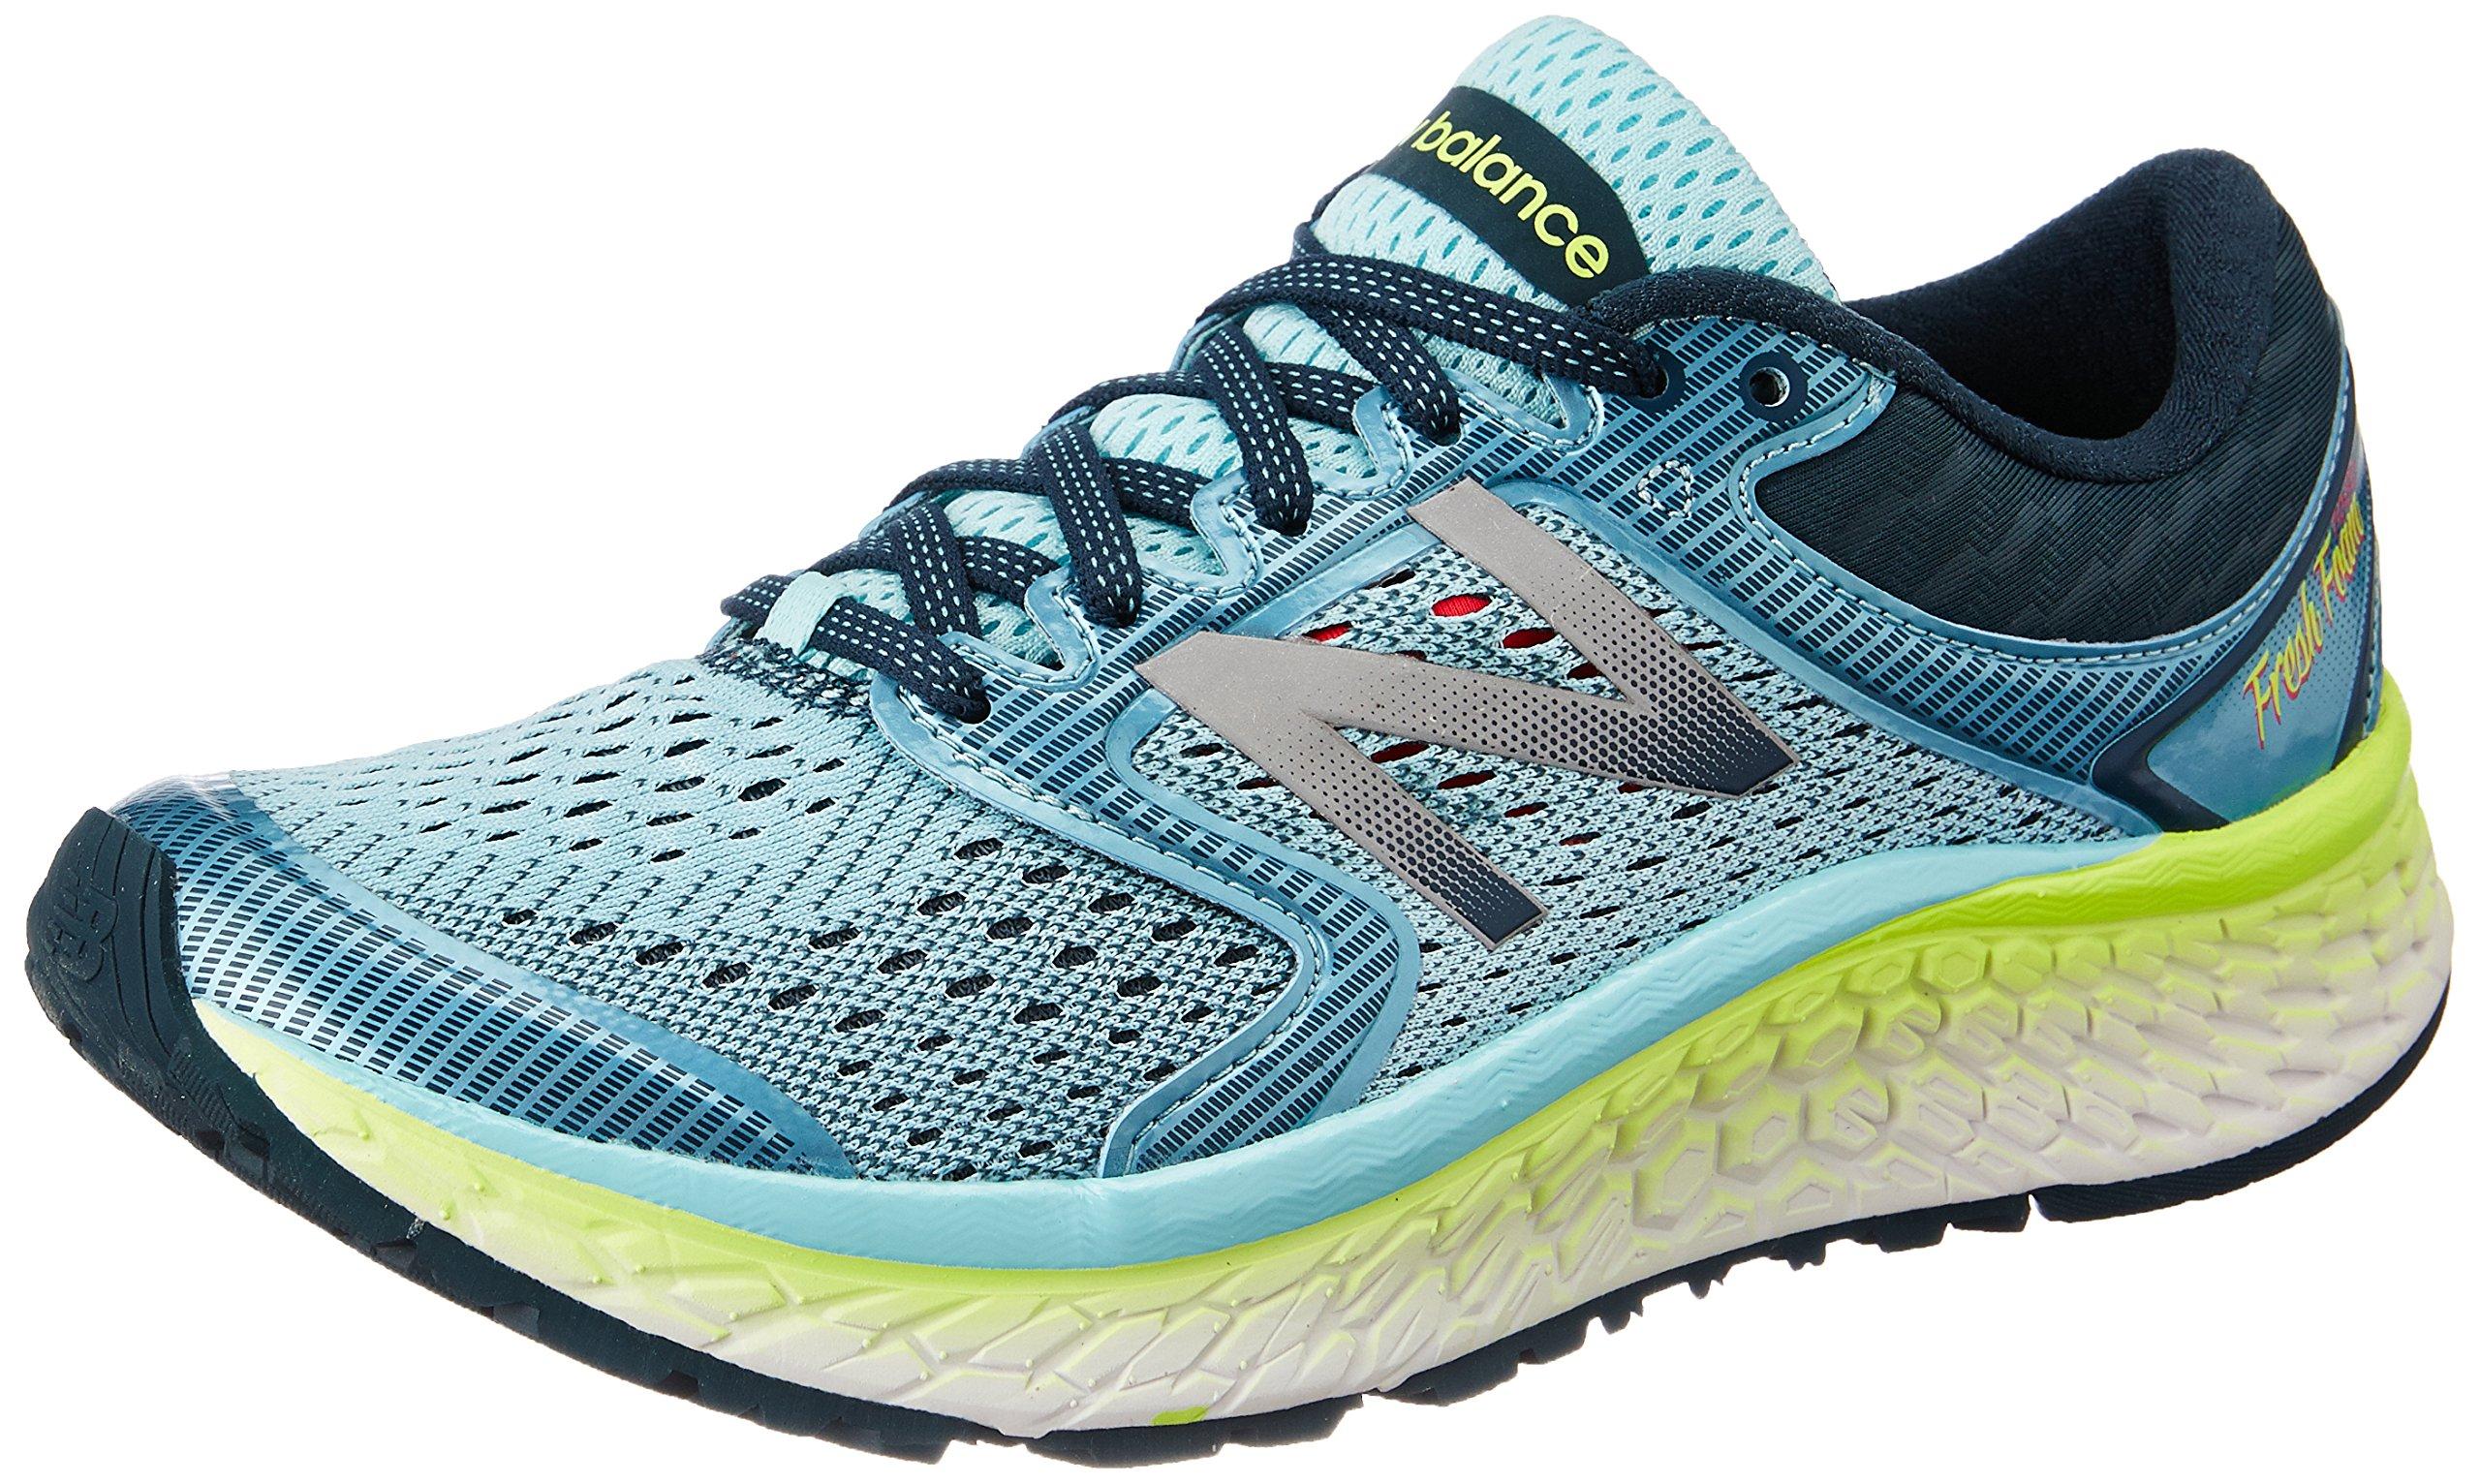 New Balance Women's W1080V7 Running Shoe, Ozone Blue Glow/Lime Glow, 12 D US